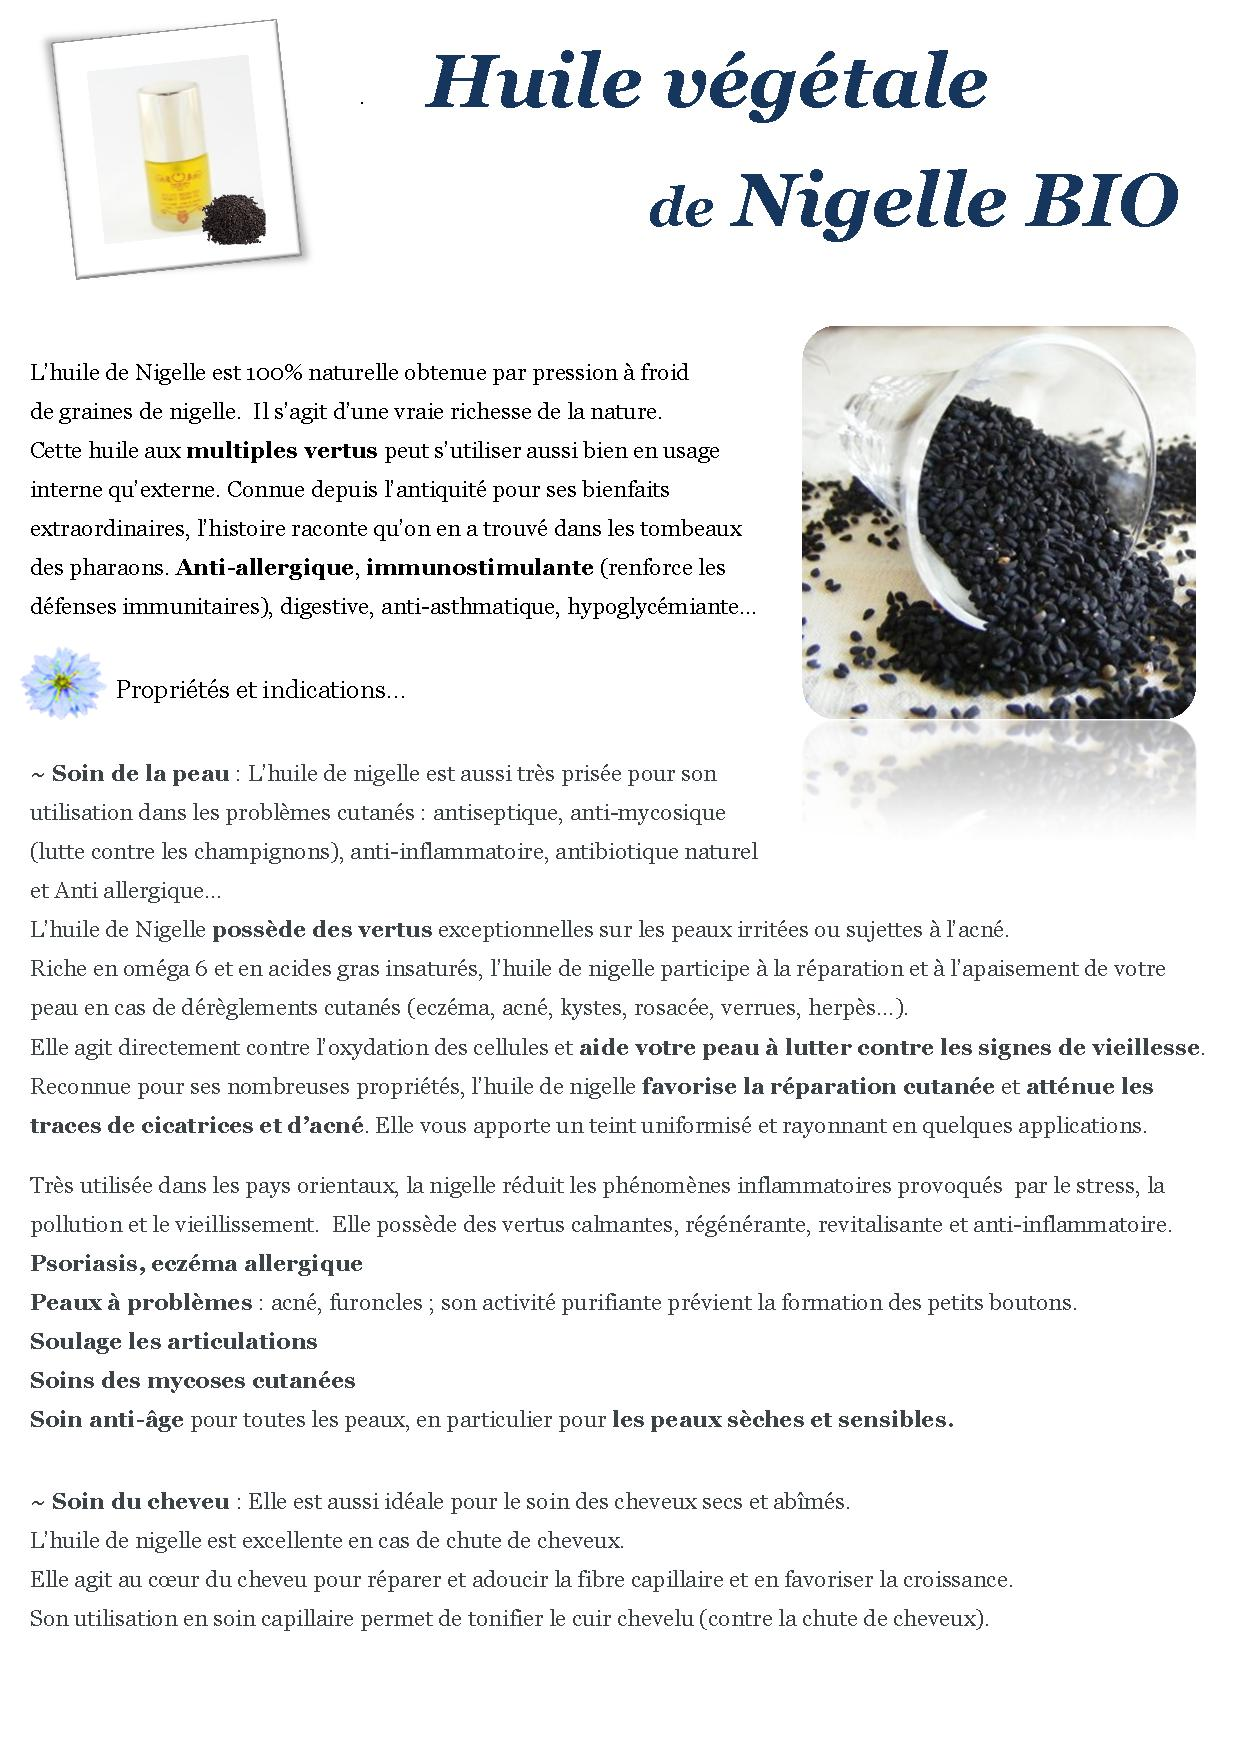 huile végétale de nigelle BIO - nabalsy.com